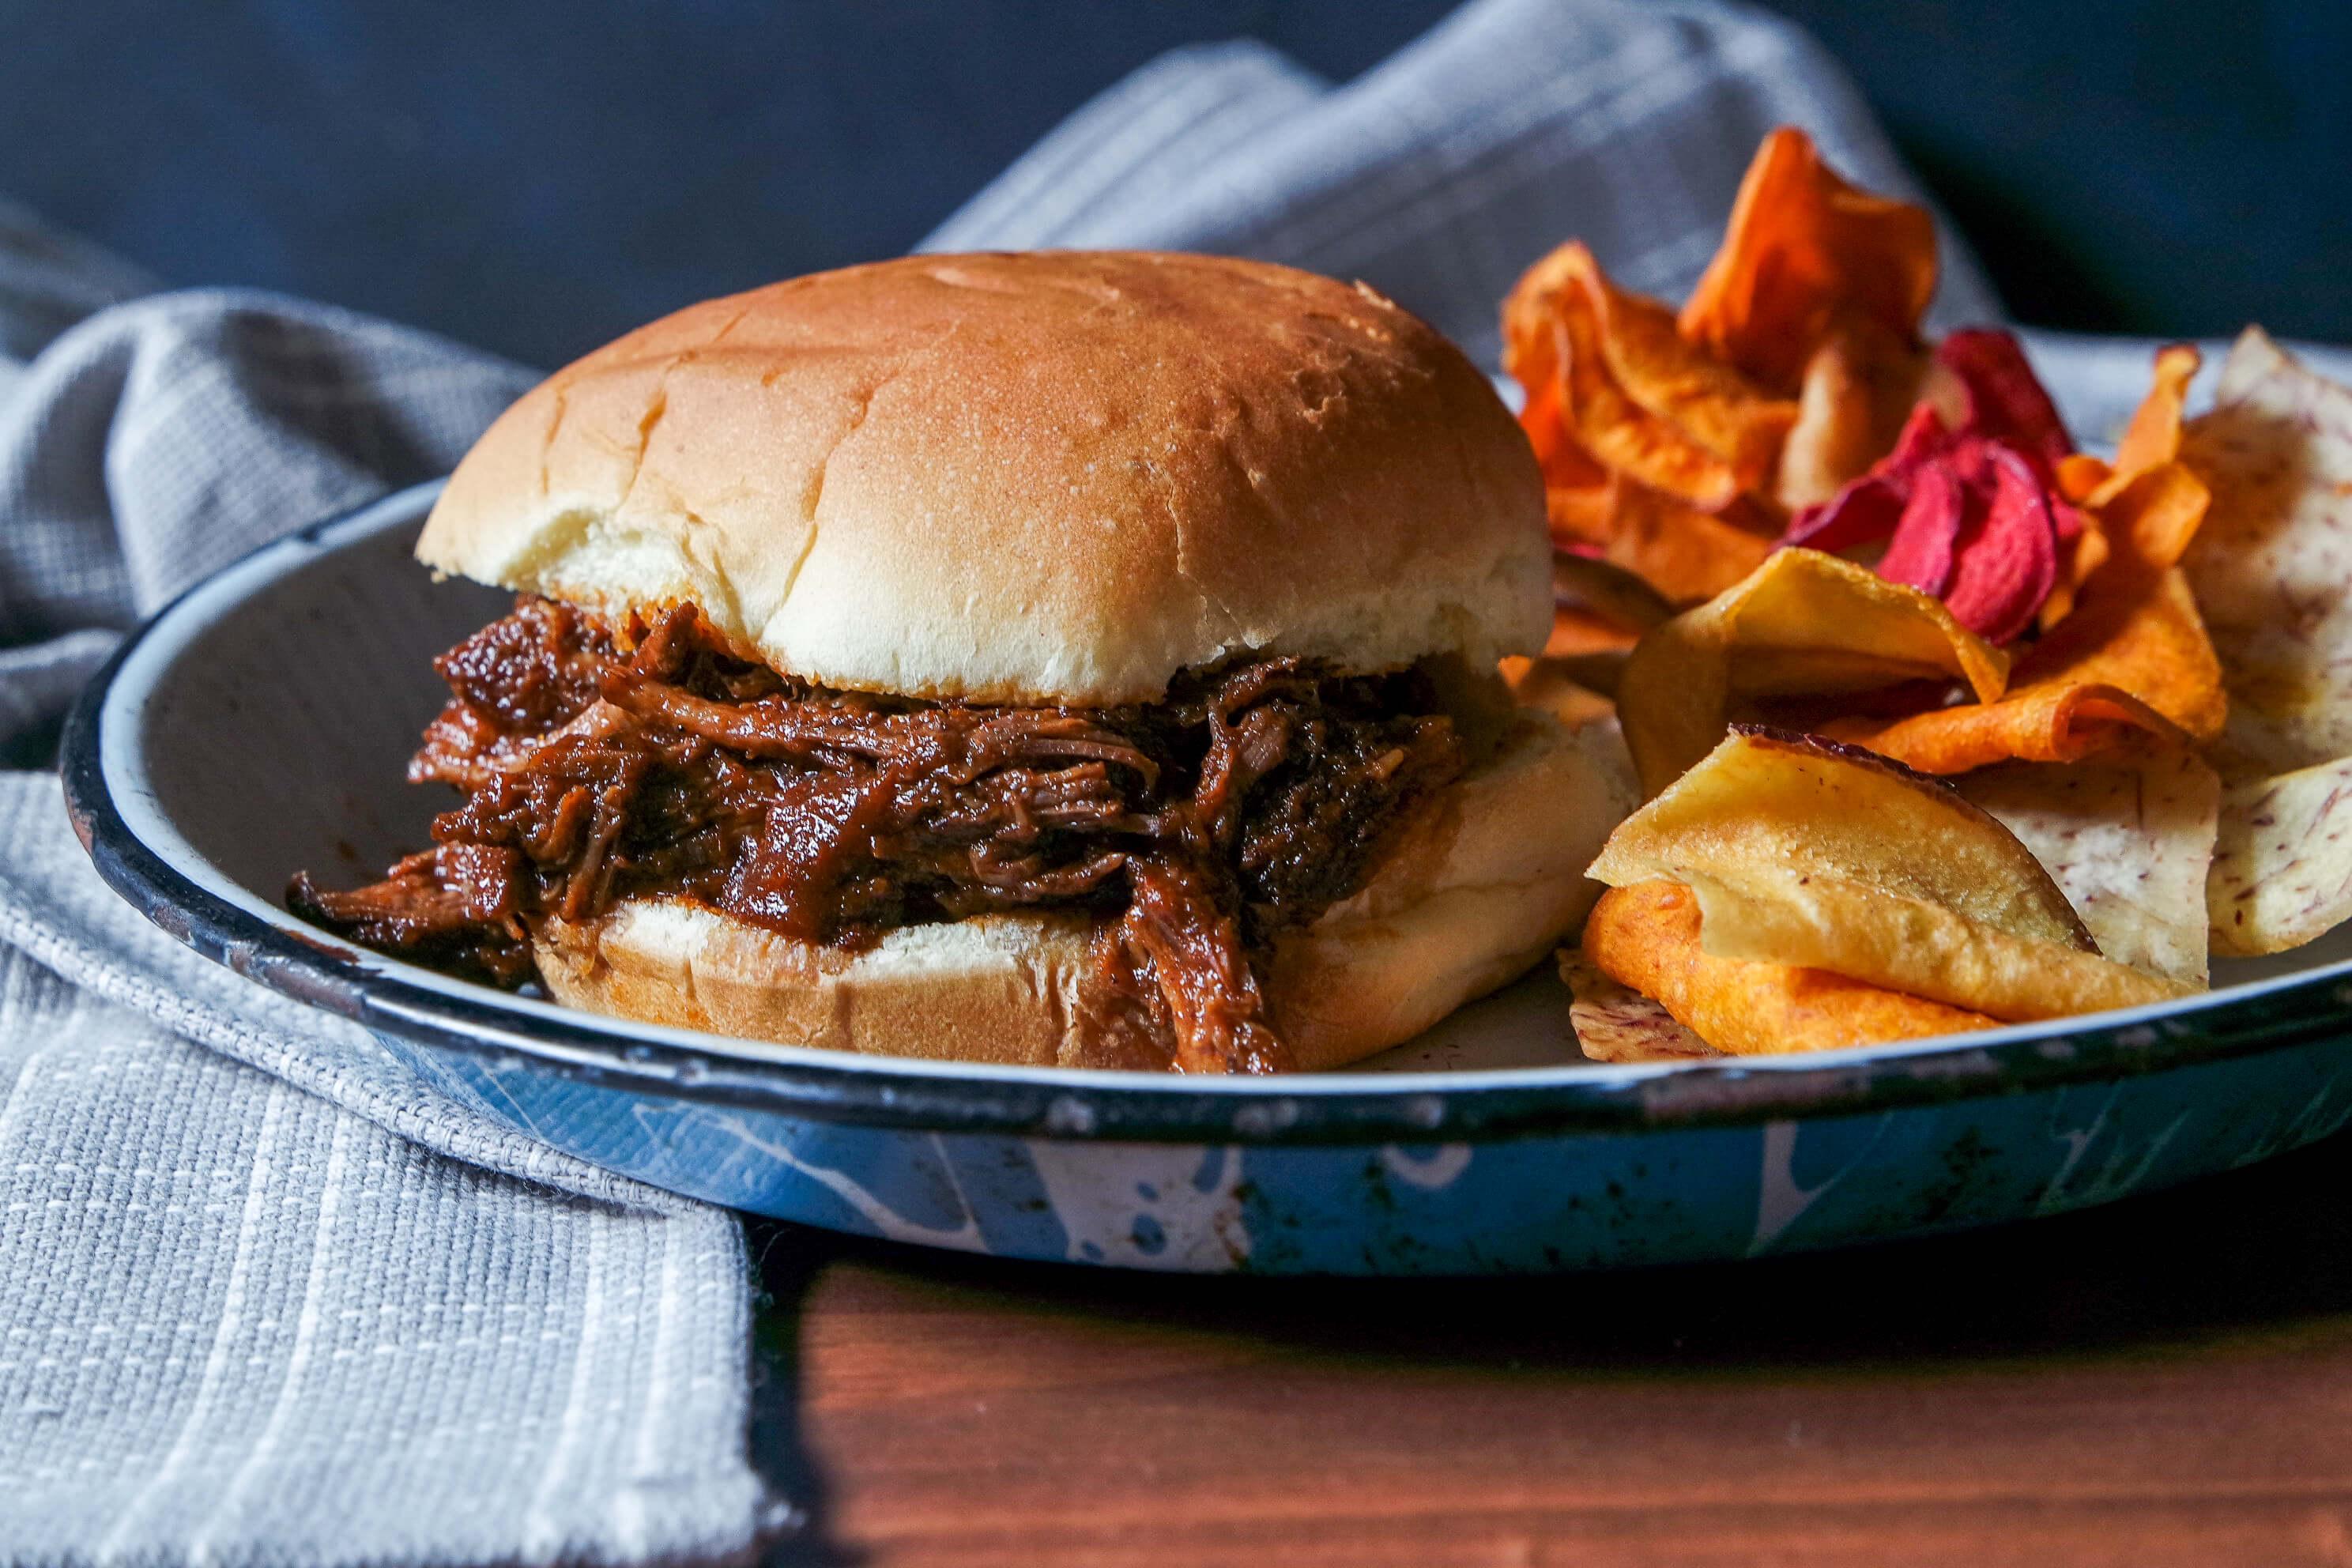 Beer Braised Shredded Beef Sandwiches Jess Pryles